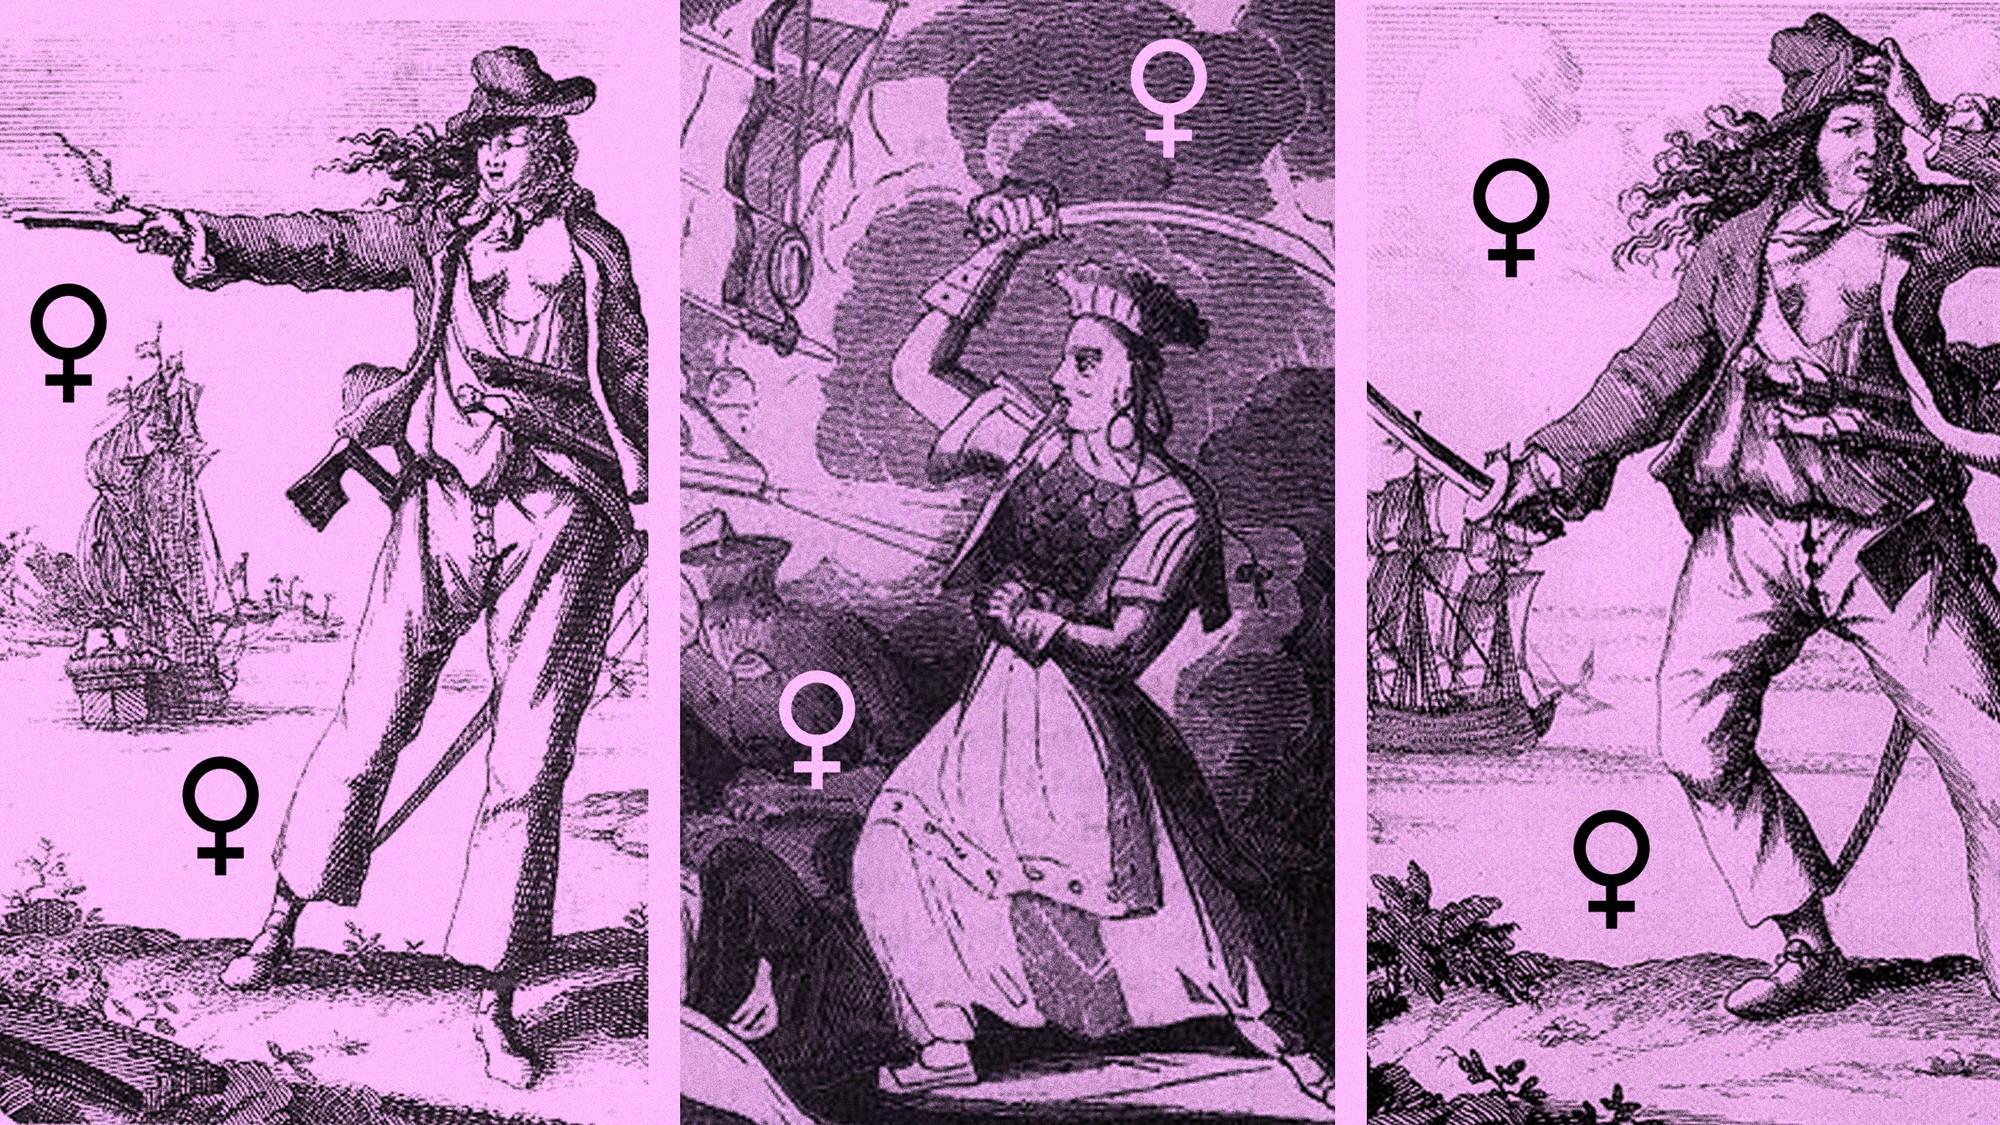 The Pirate Women Who Made Blackbeard Look Like a Joke - VICE